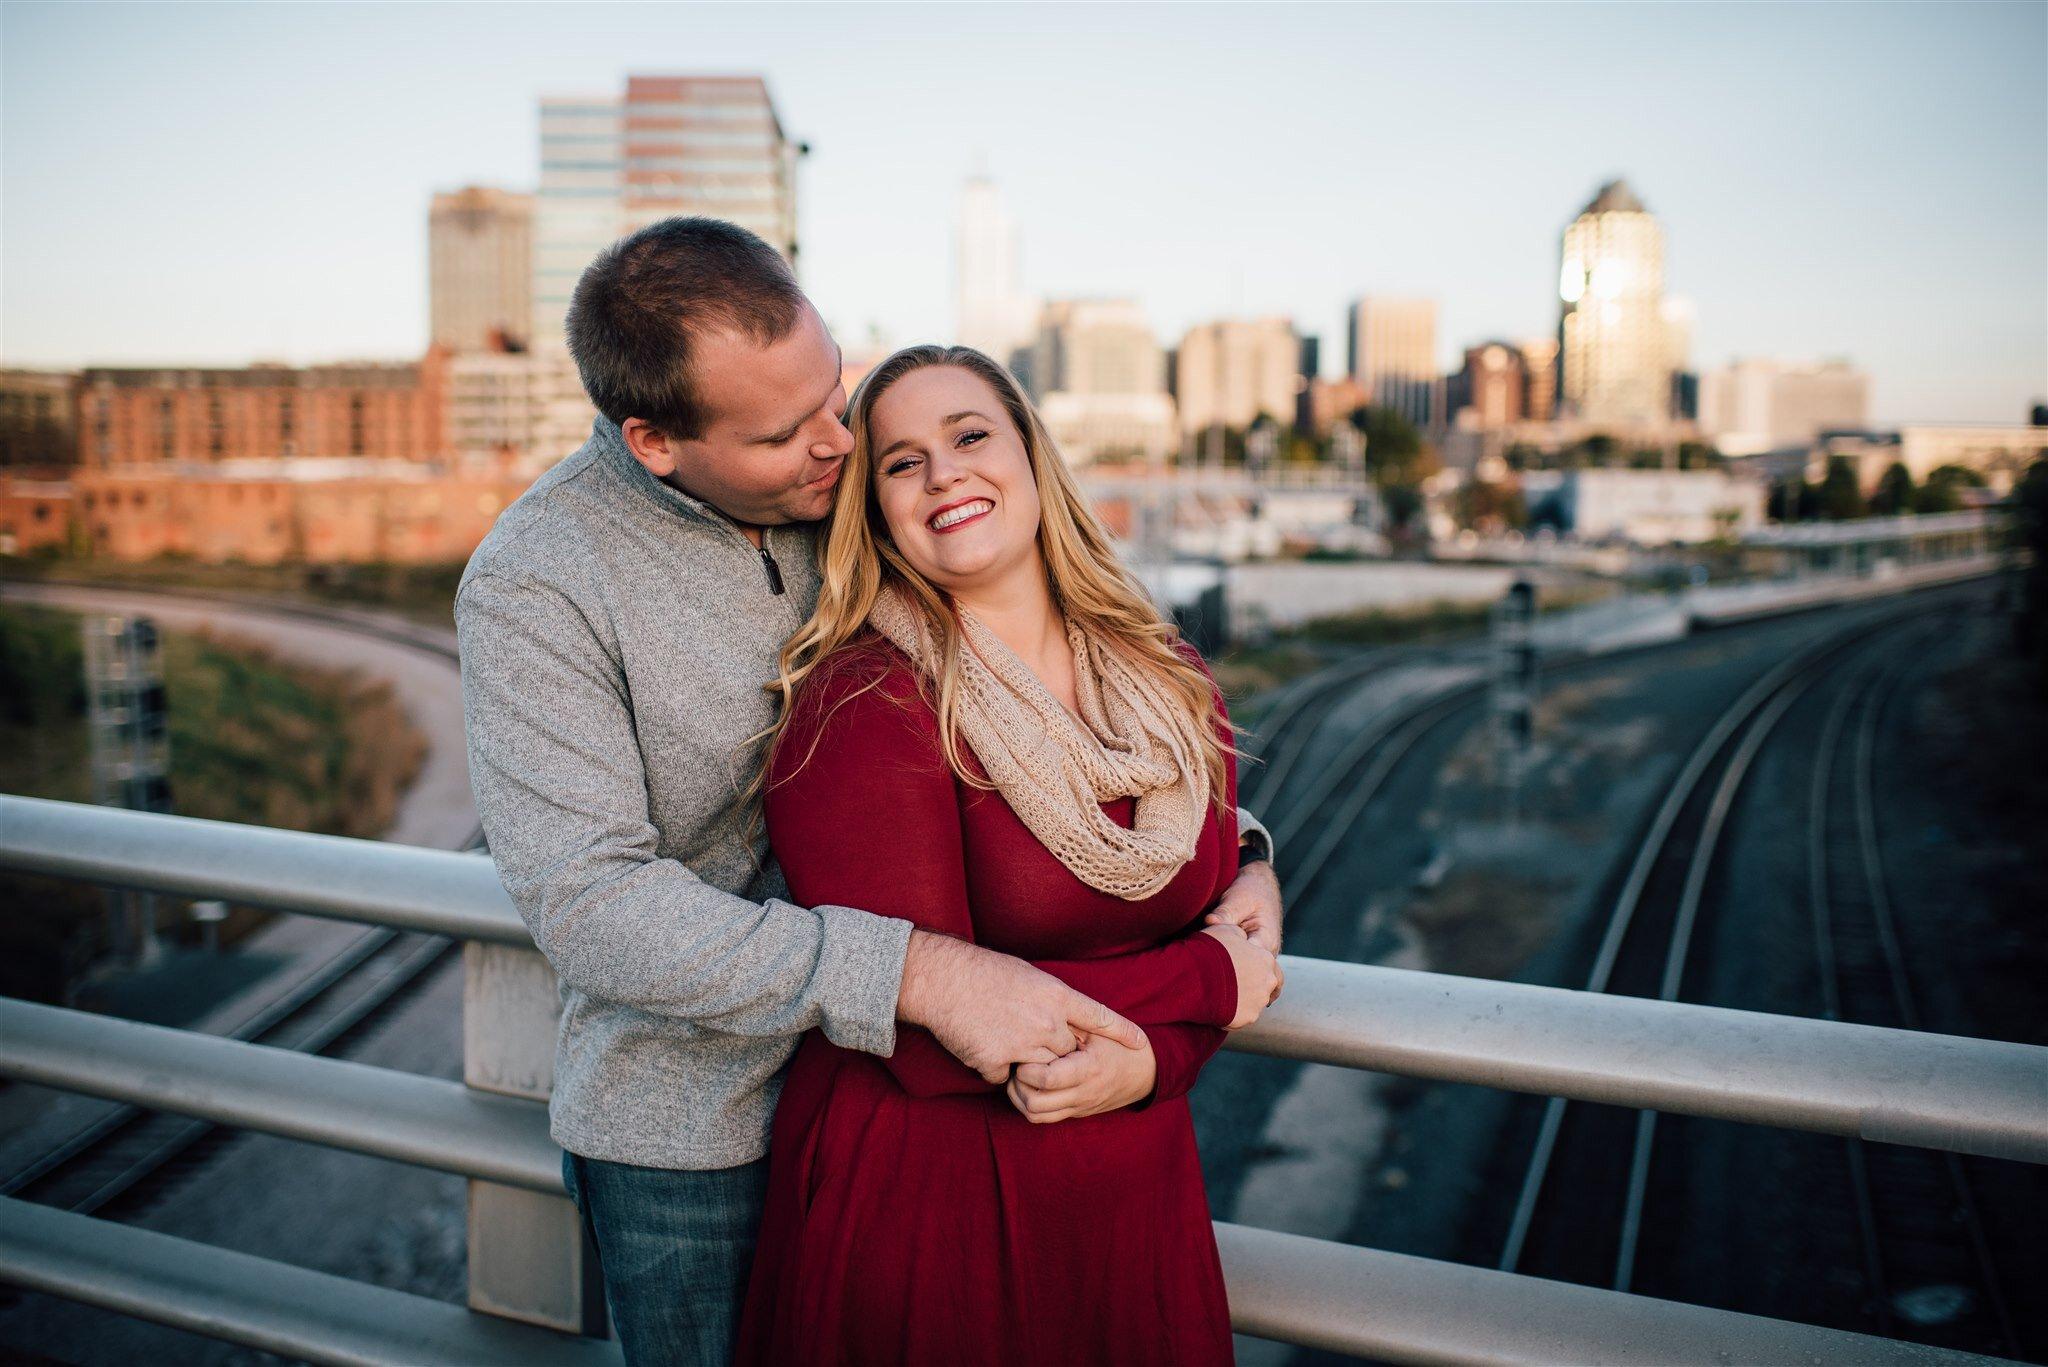 Boylan Bridge Proposal - Raleigh Engagement Photographer - North Carolina Wedding Photographer - Raleigh Surprise Proposal